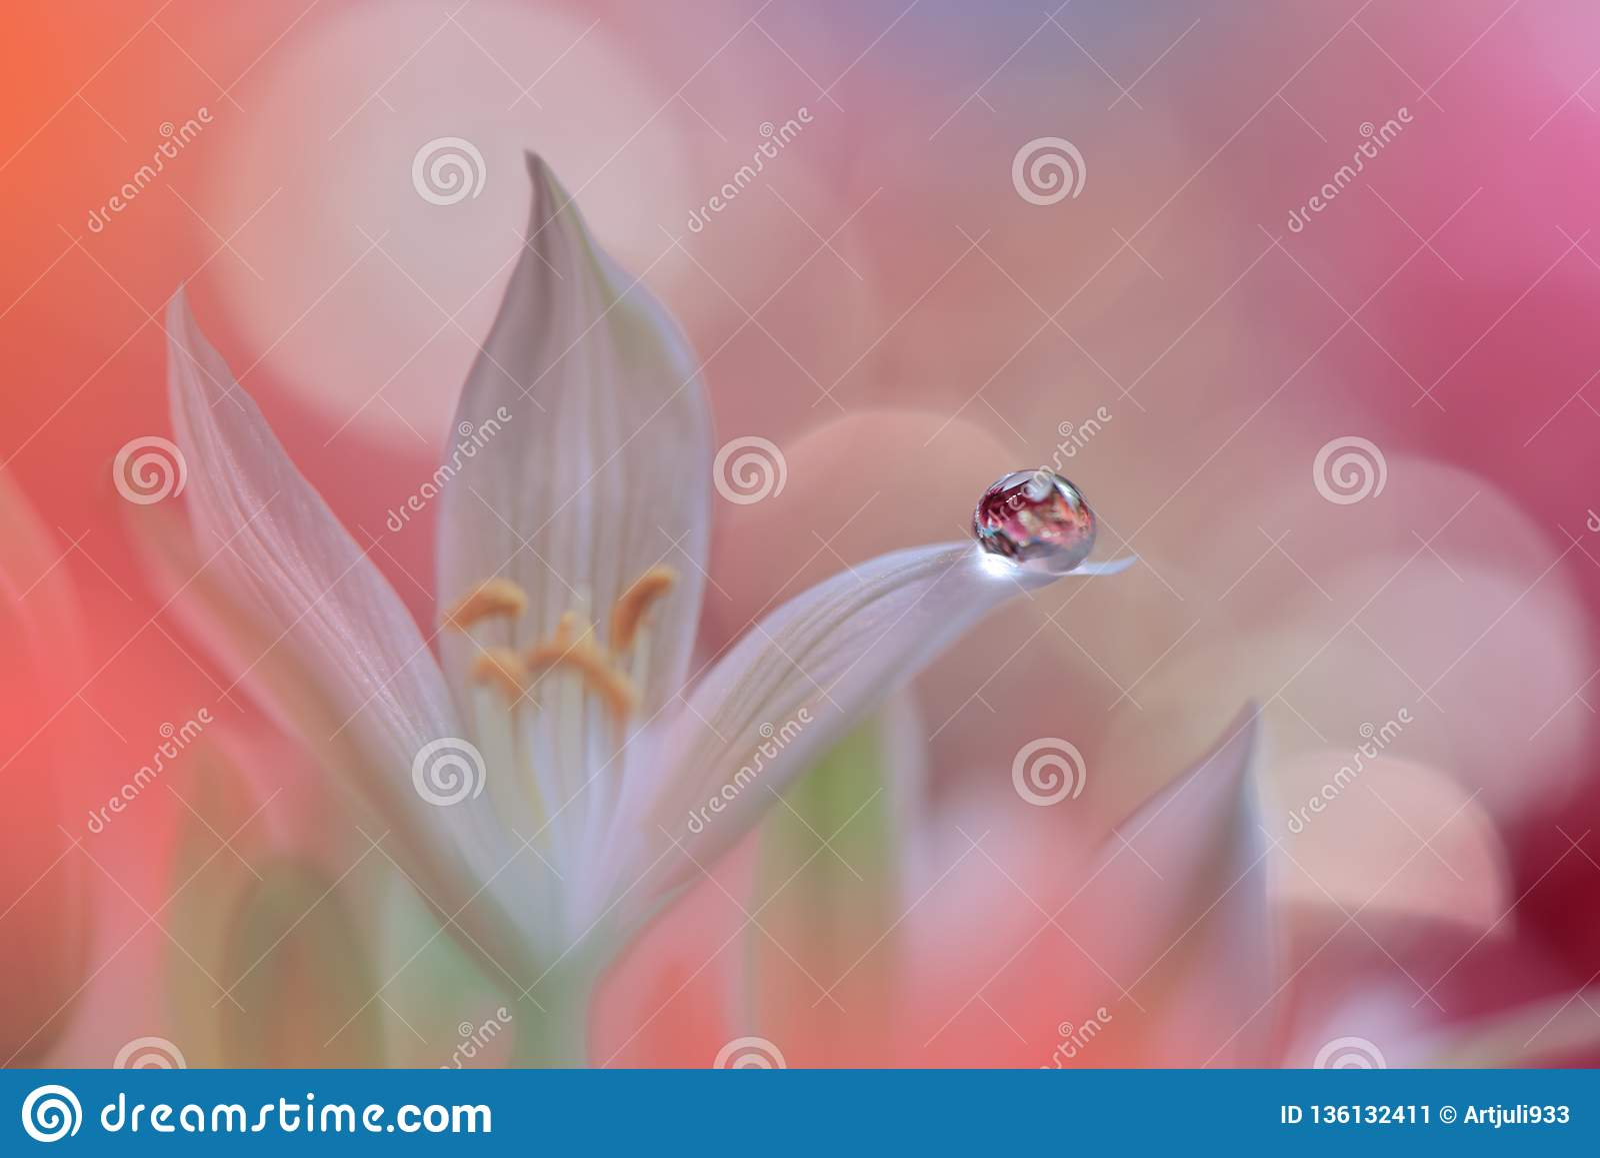 Spring nature blossom web banner or header.Abstract macro photo.Artistic Background.Fantasy design.Colorful Wallpaper.Artwork,Drop